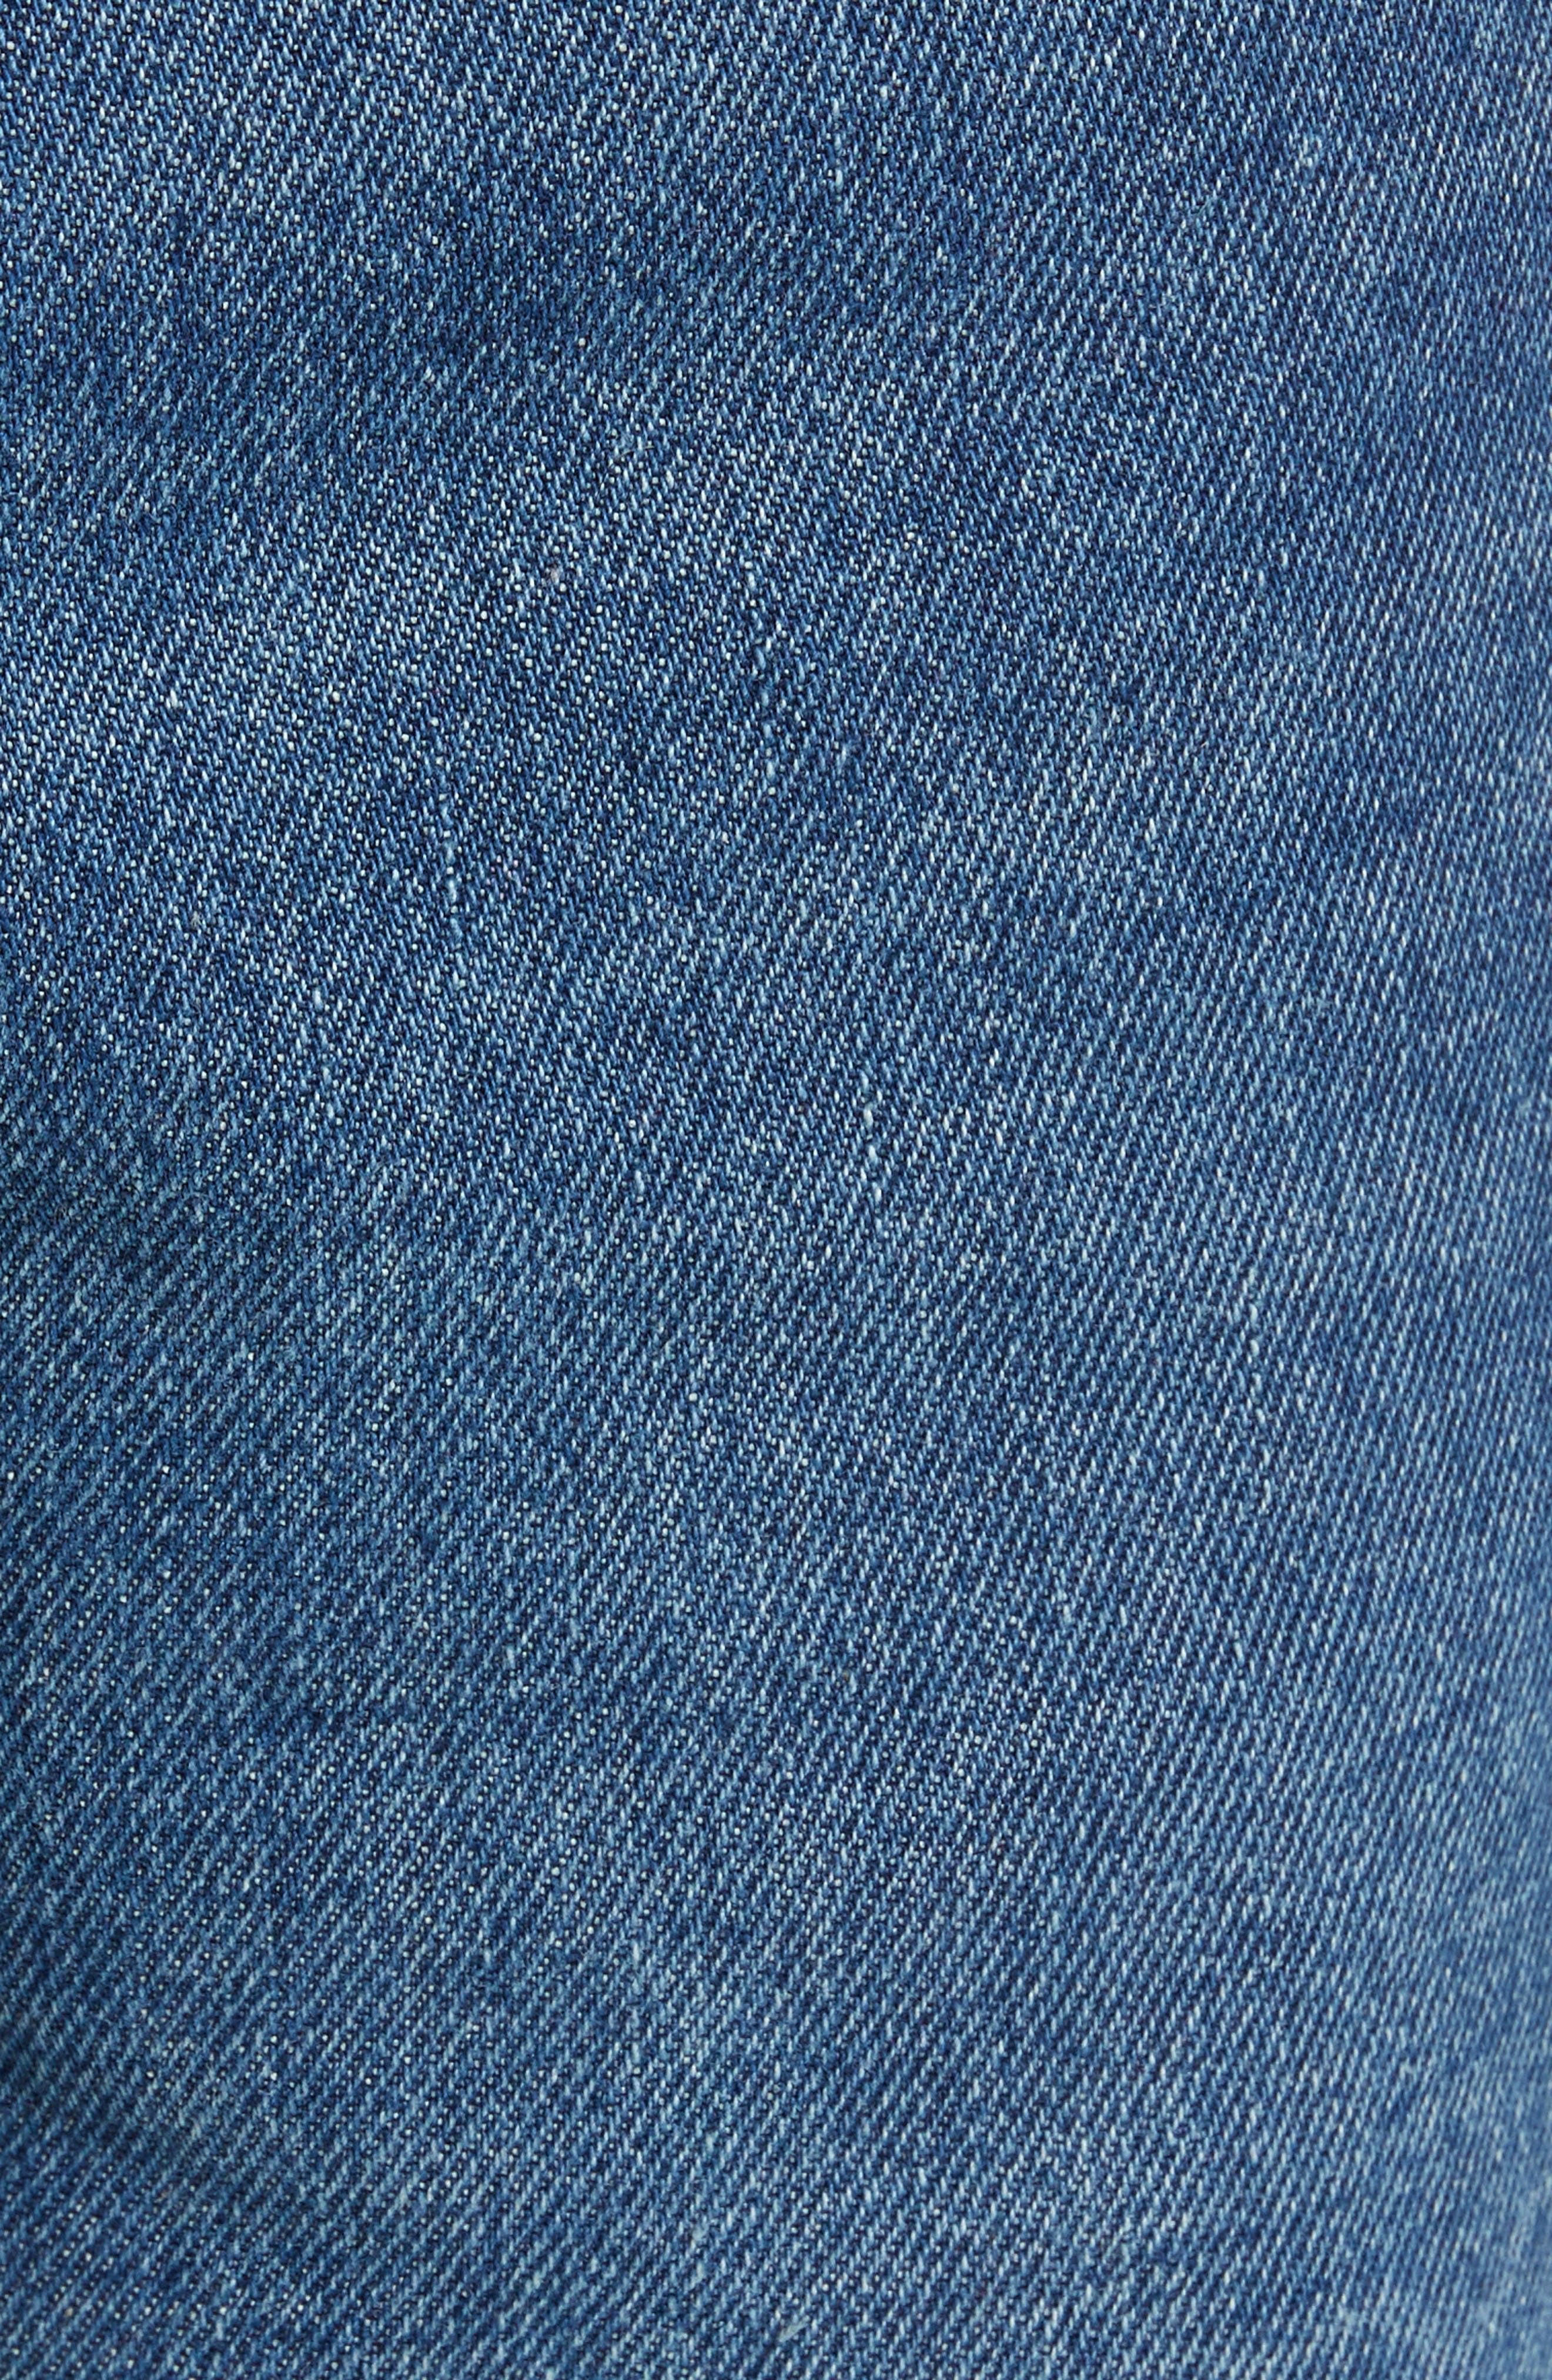 Labor Straight Leg Jeans,                             Alternate thumbnail 5, color,                             400